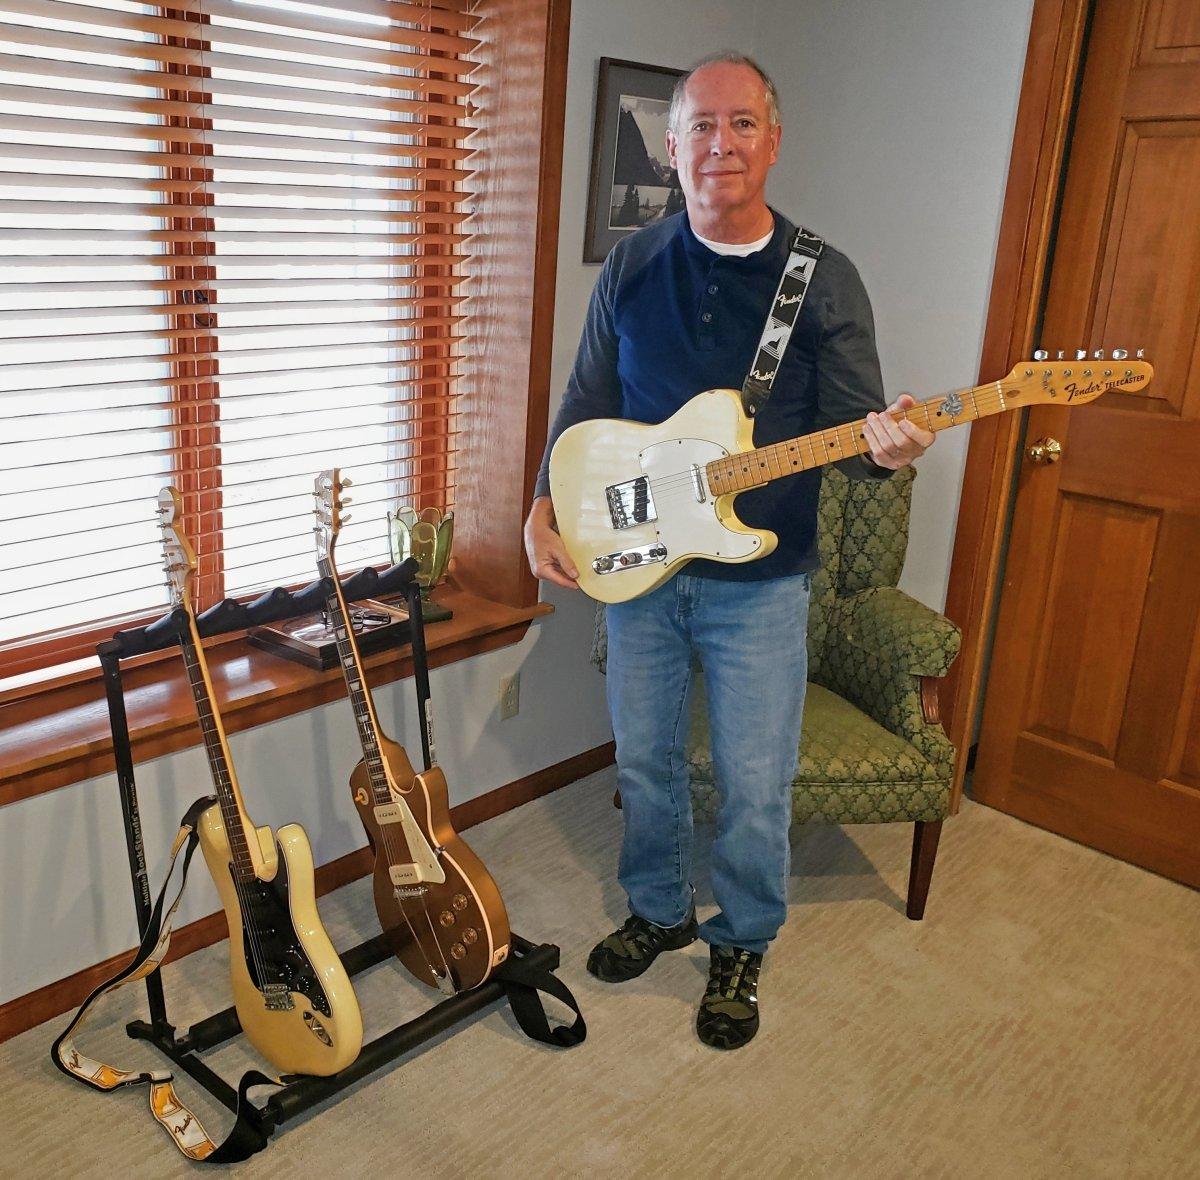 guitarist with guitars